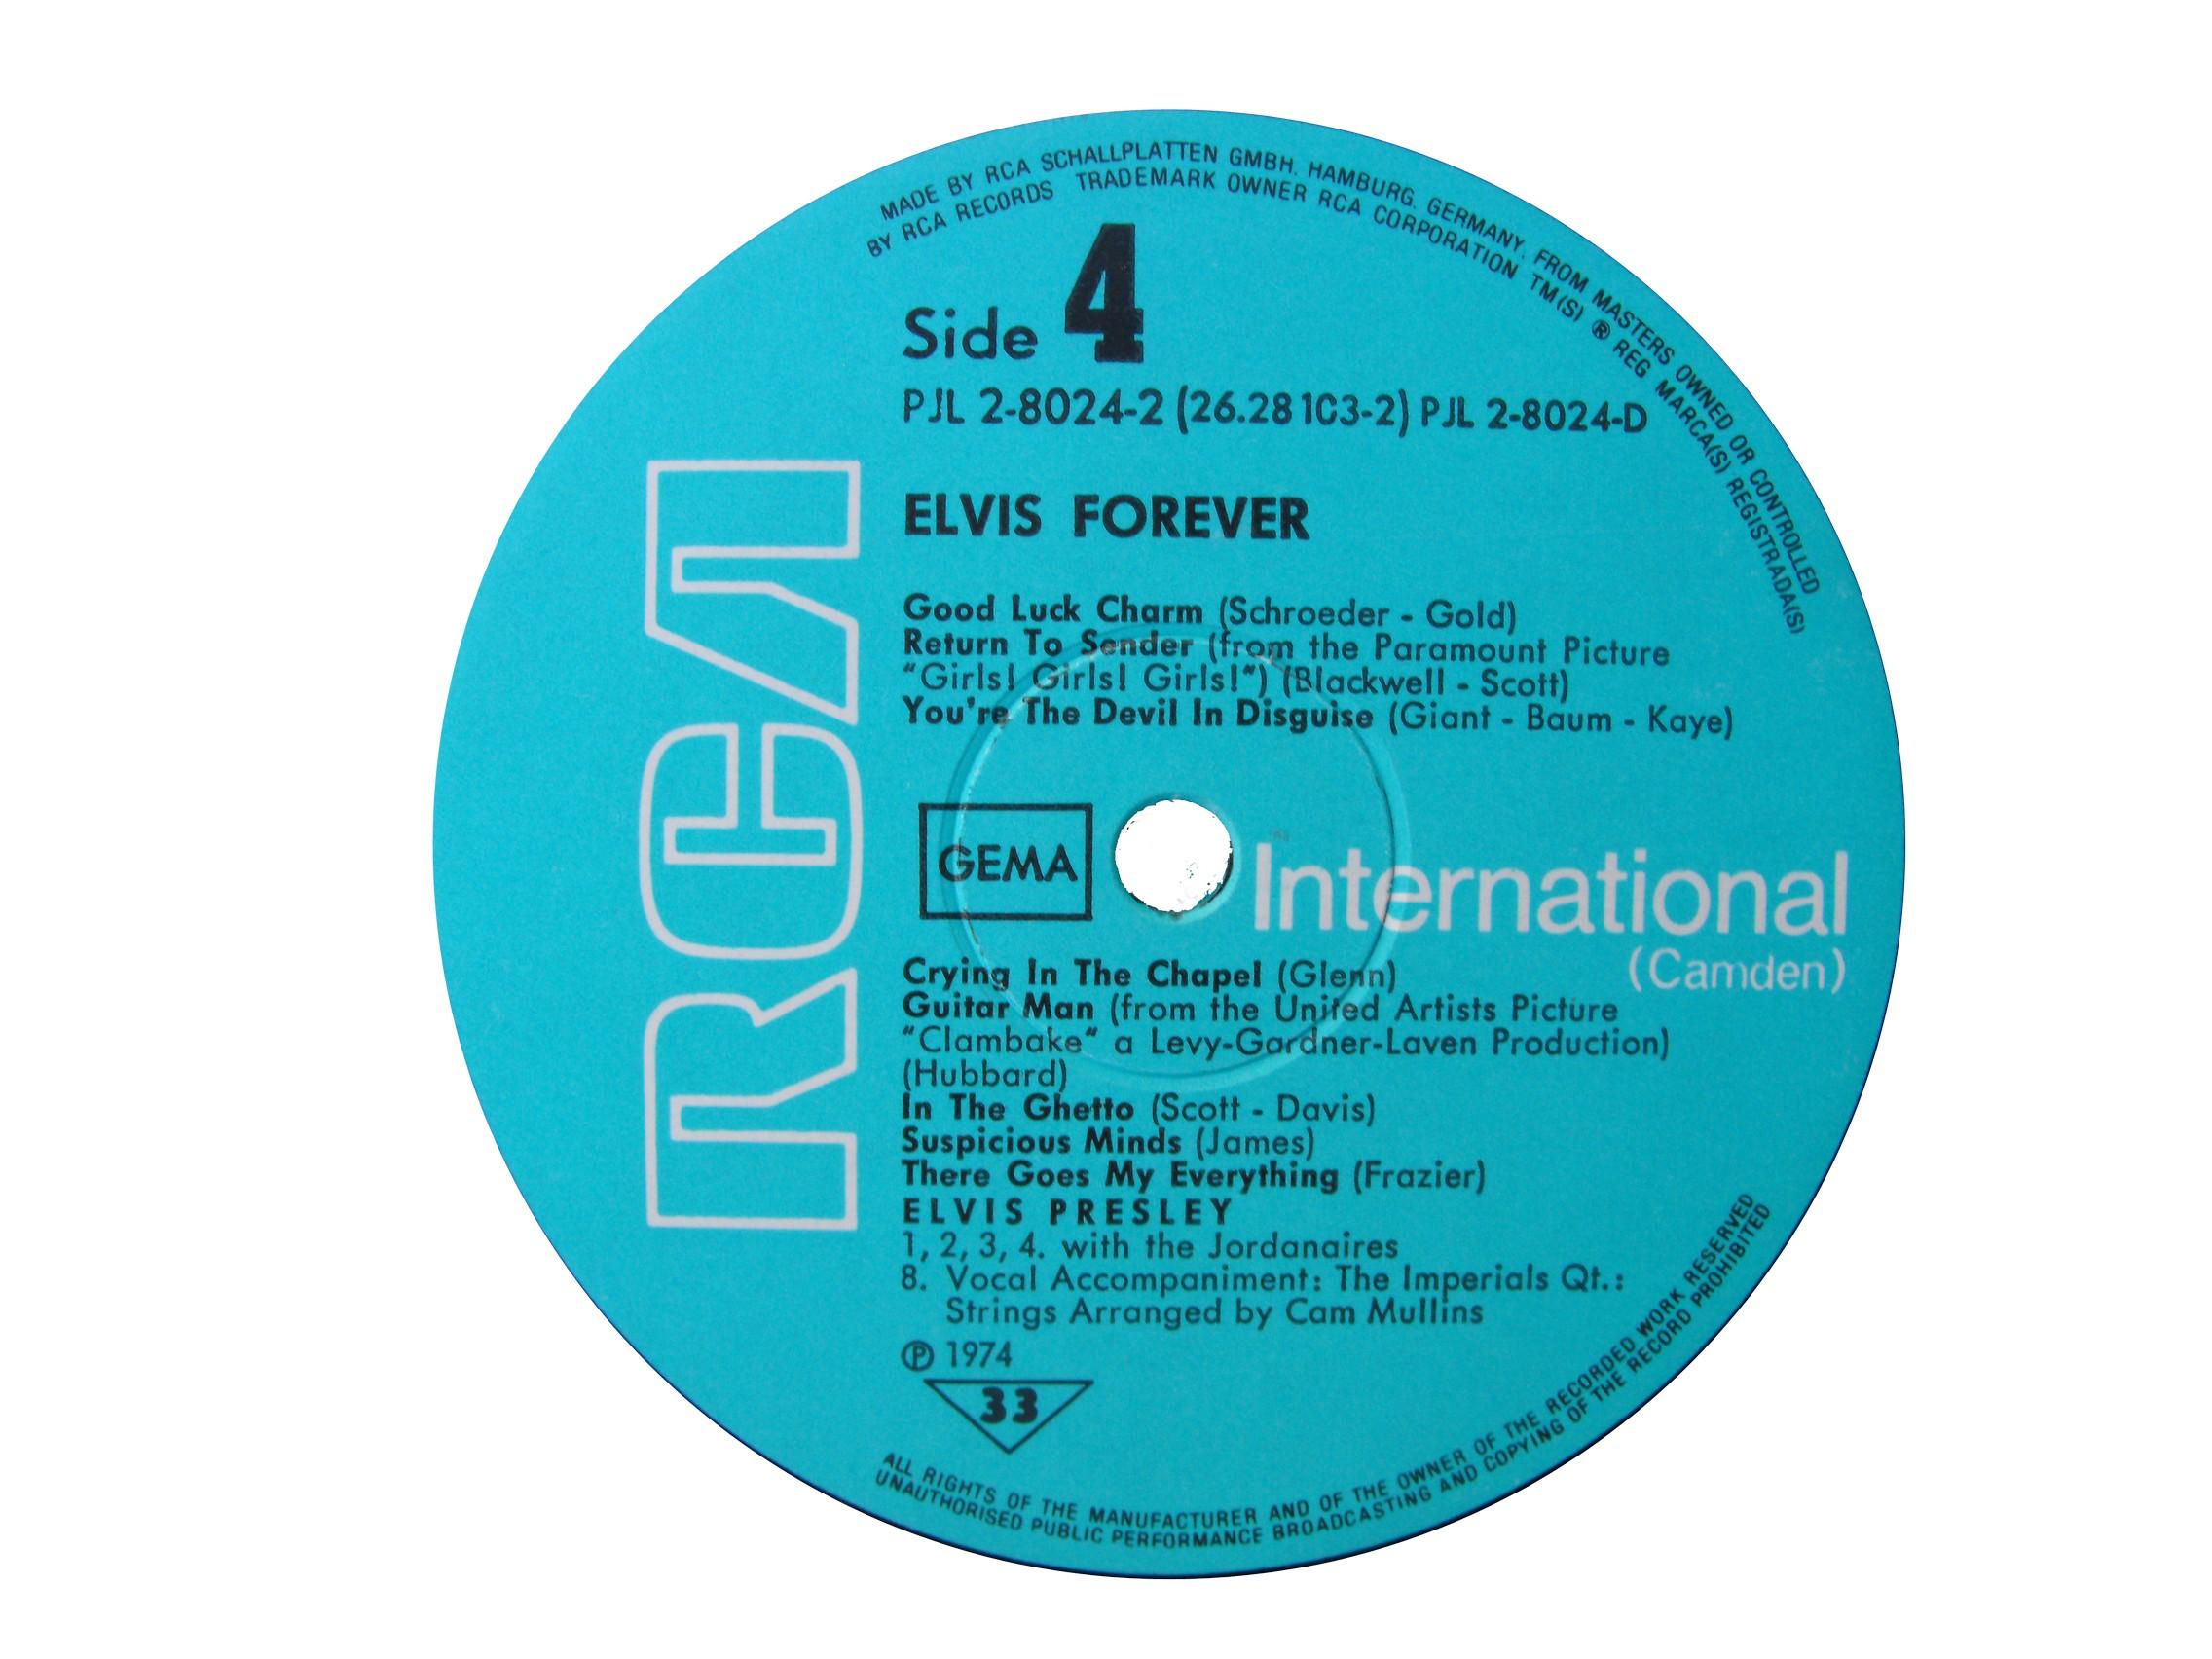 ELVIS FOREVER - 32 HITS Efside41975qddnw